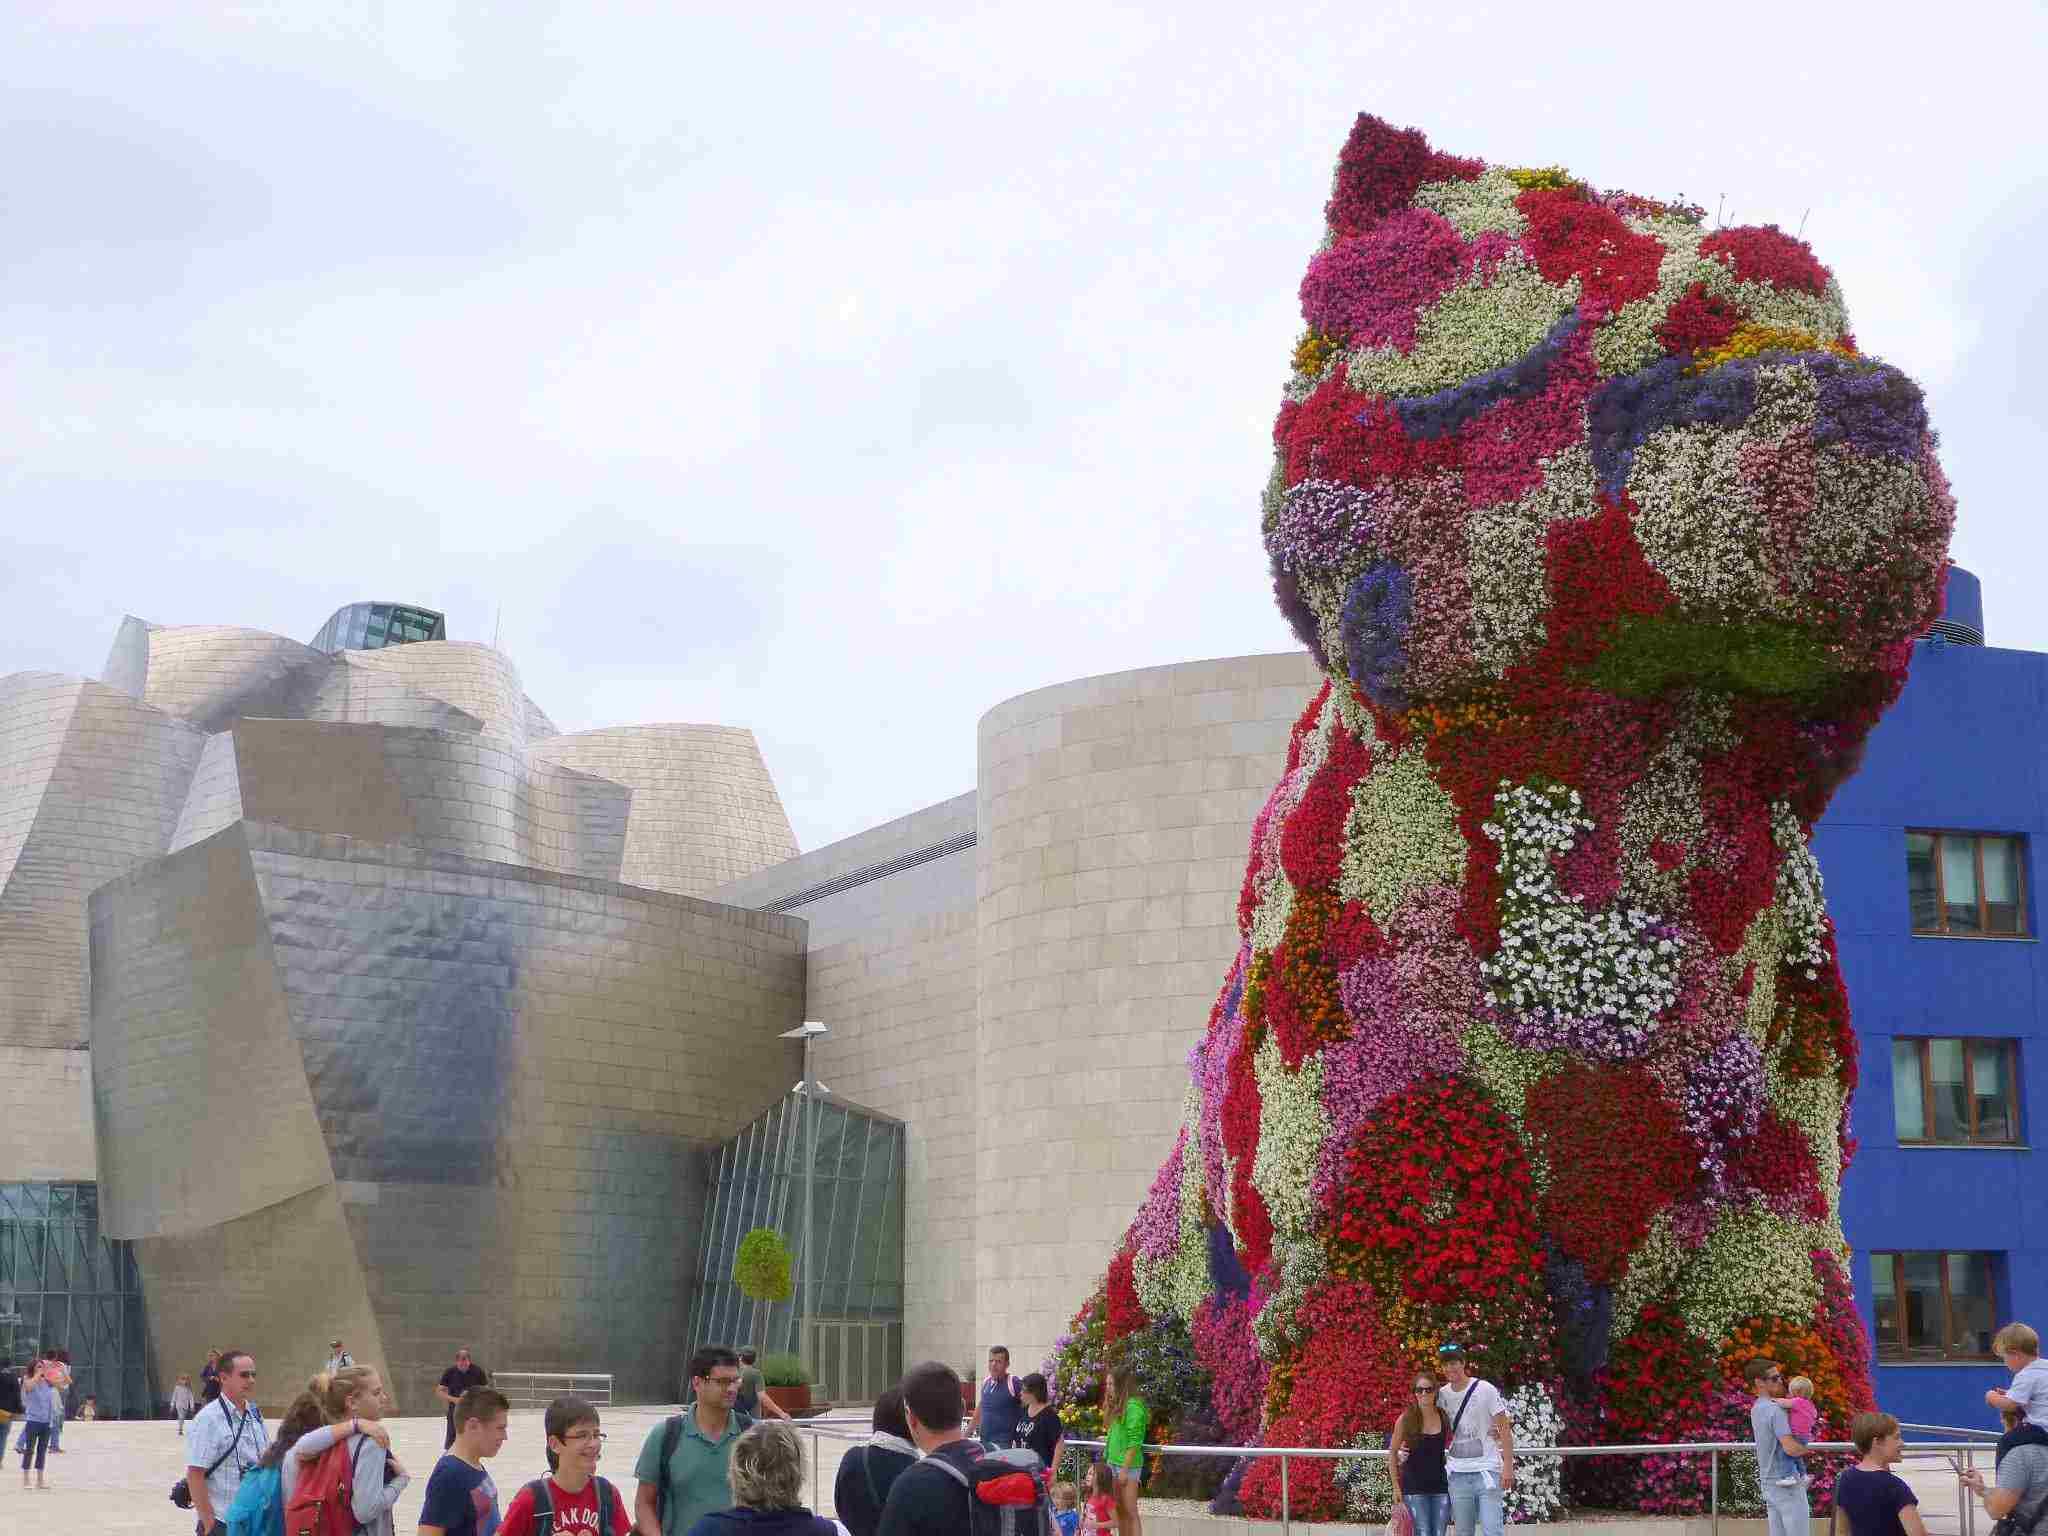 Escultura 'Puppy', de Jeff Koons